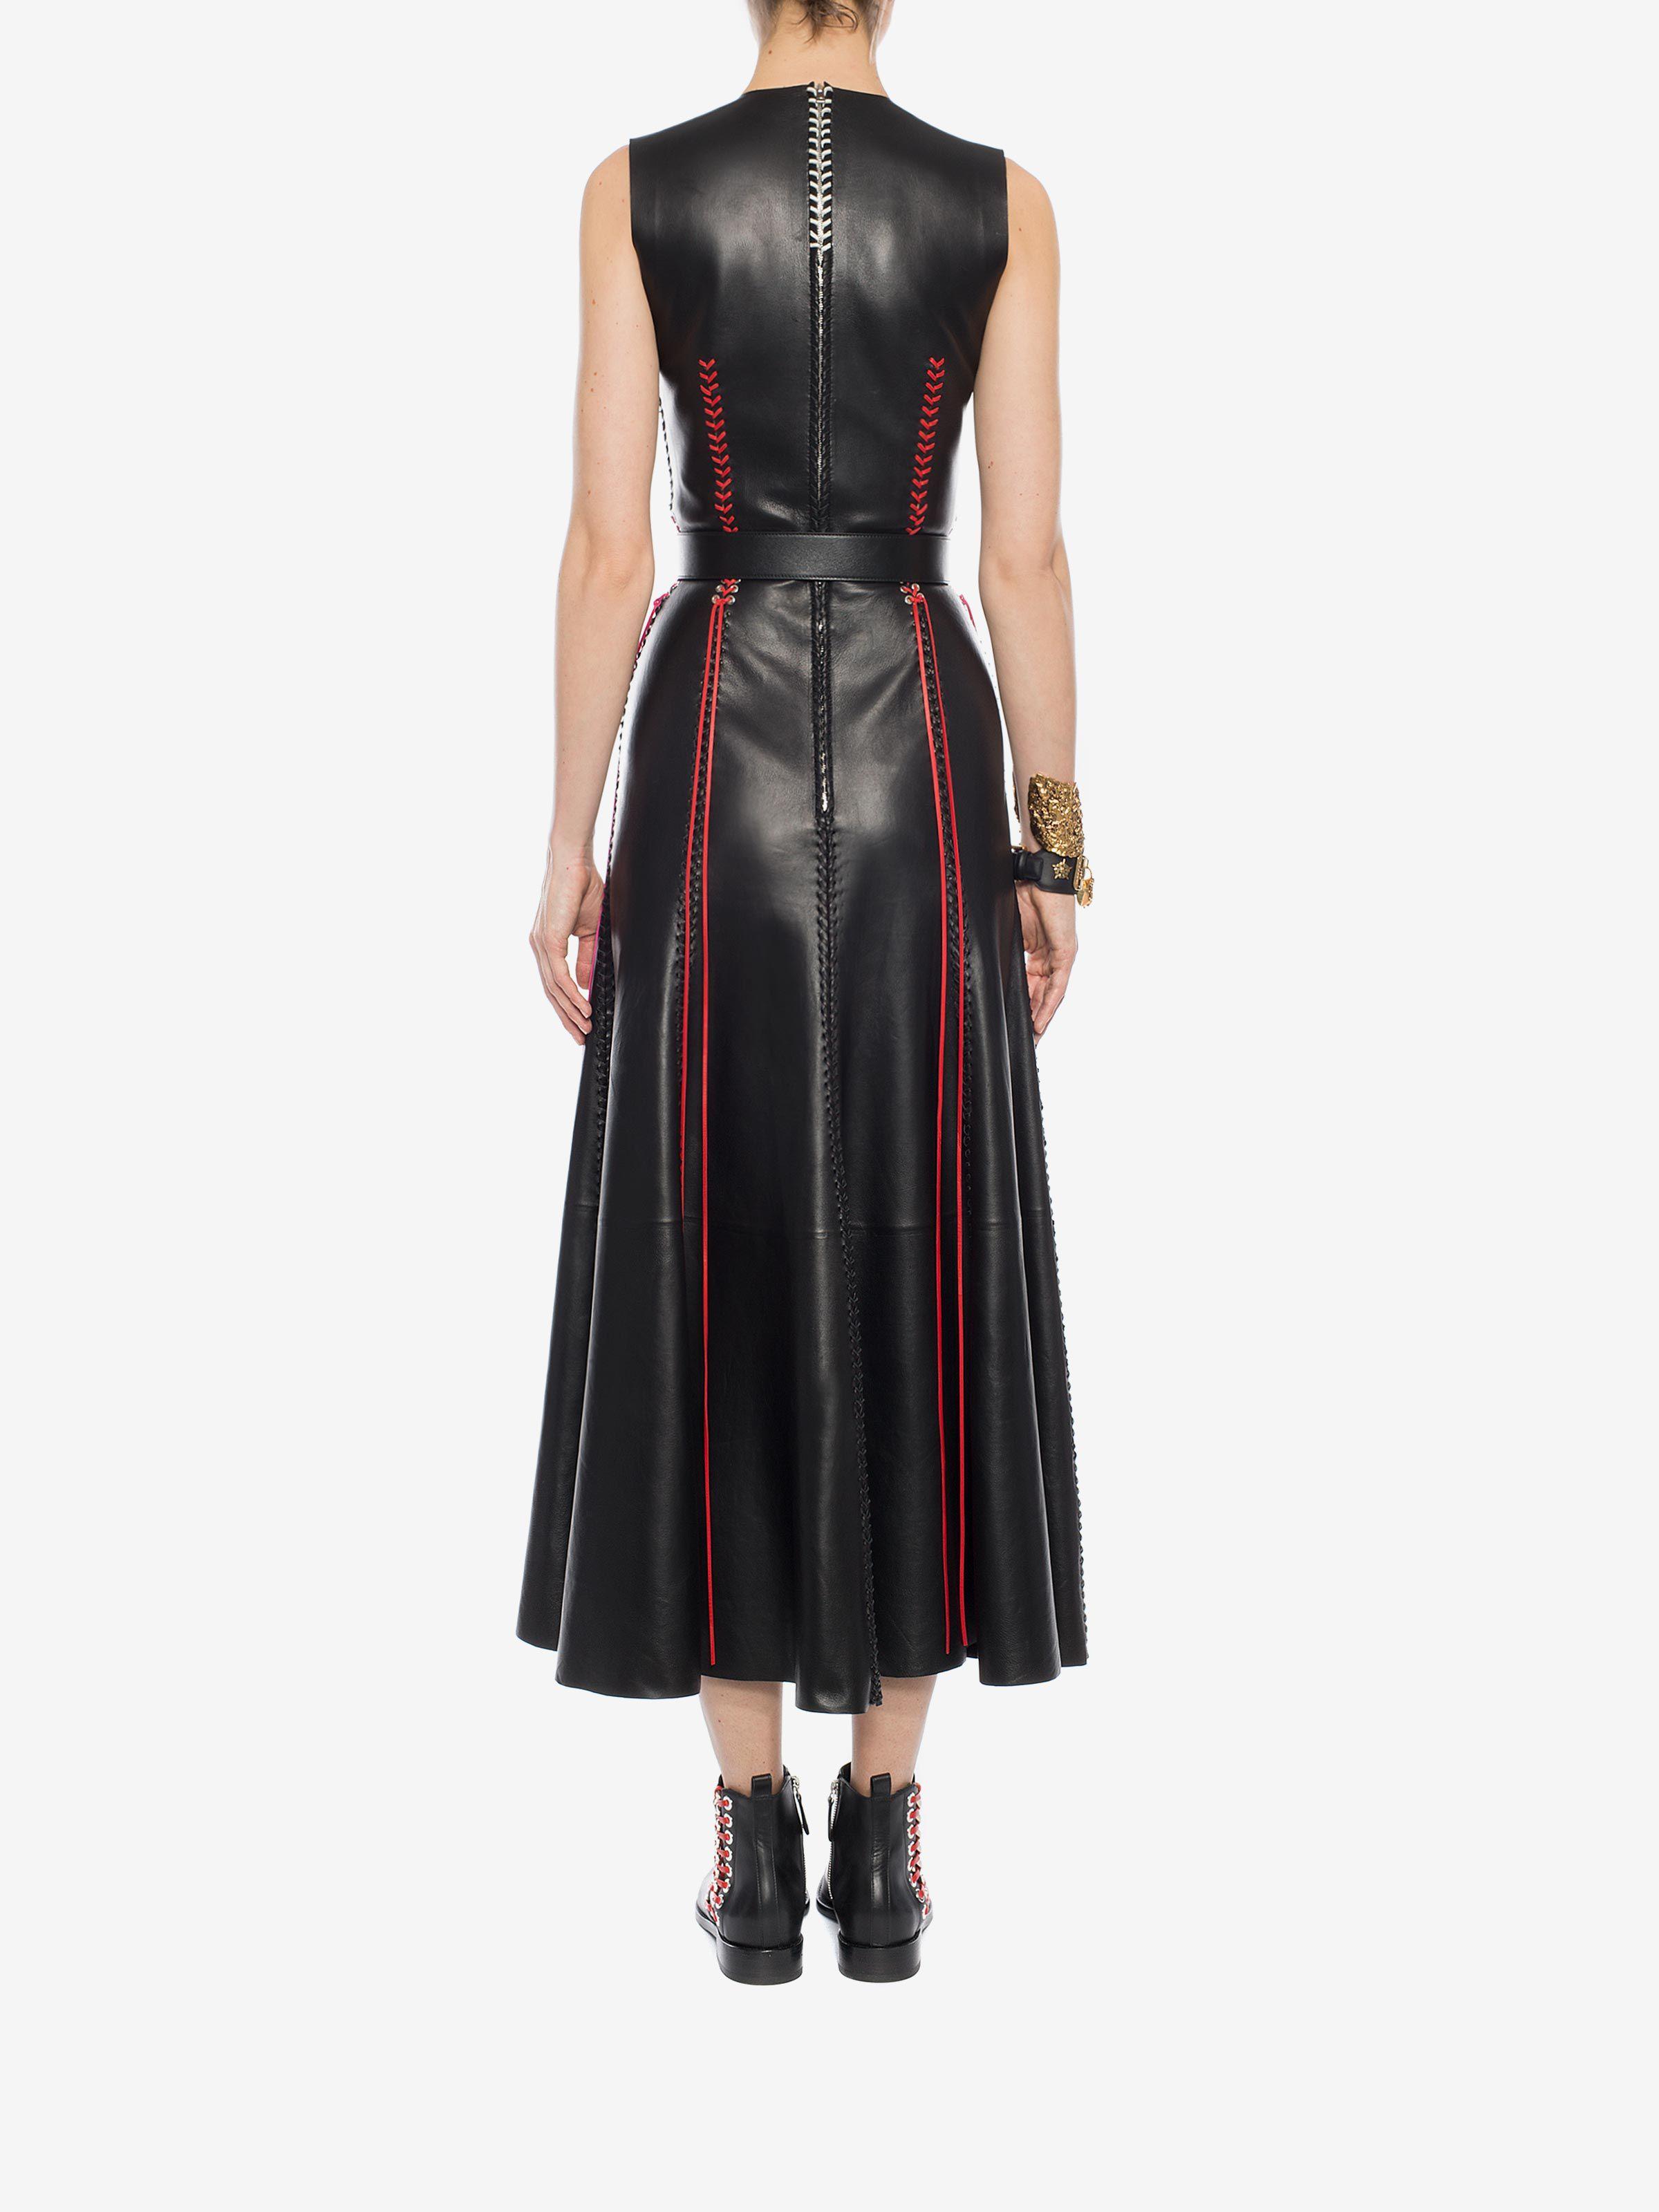 Alexander mcqueen whipstitched leather dress long dress d e